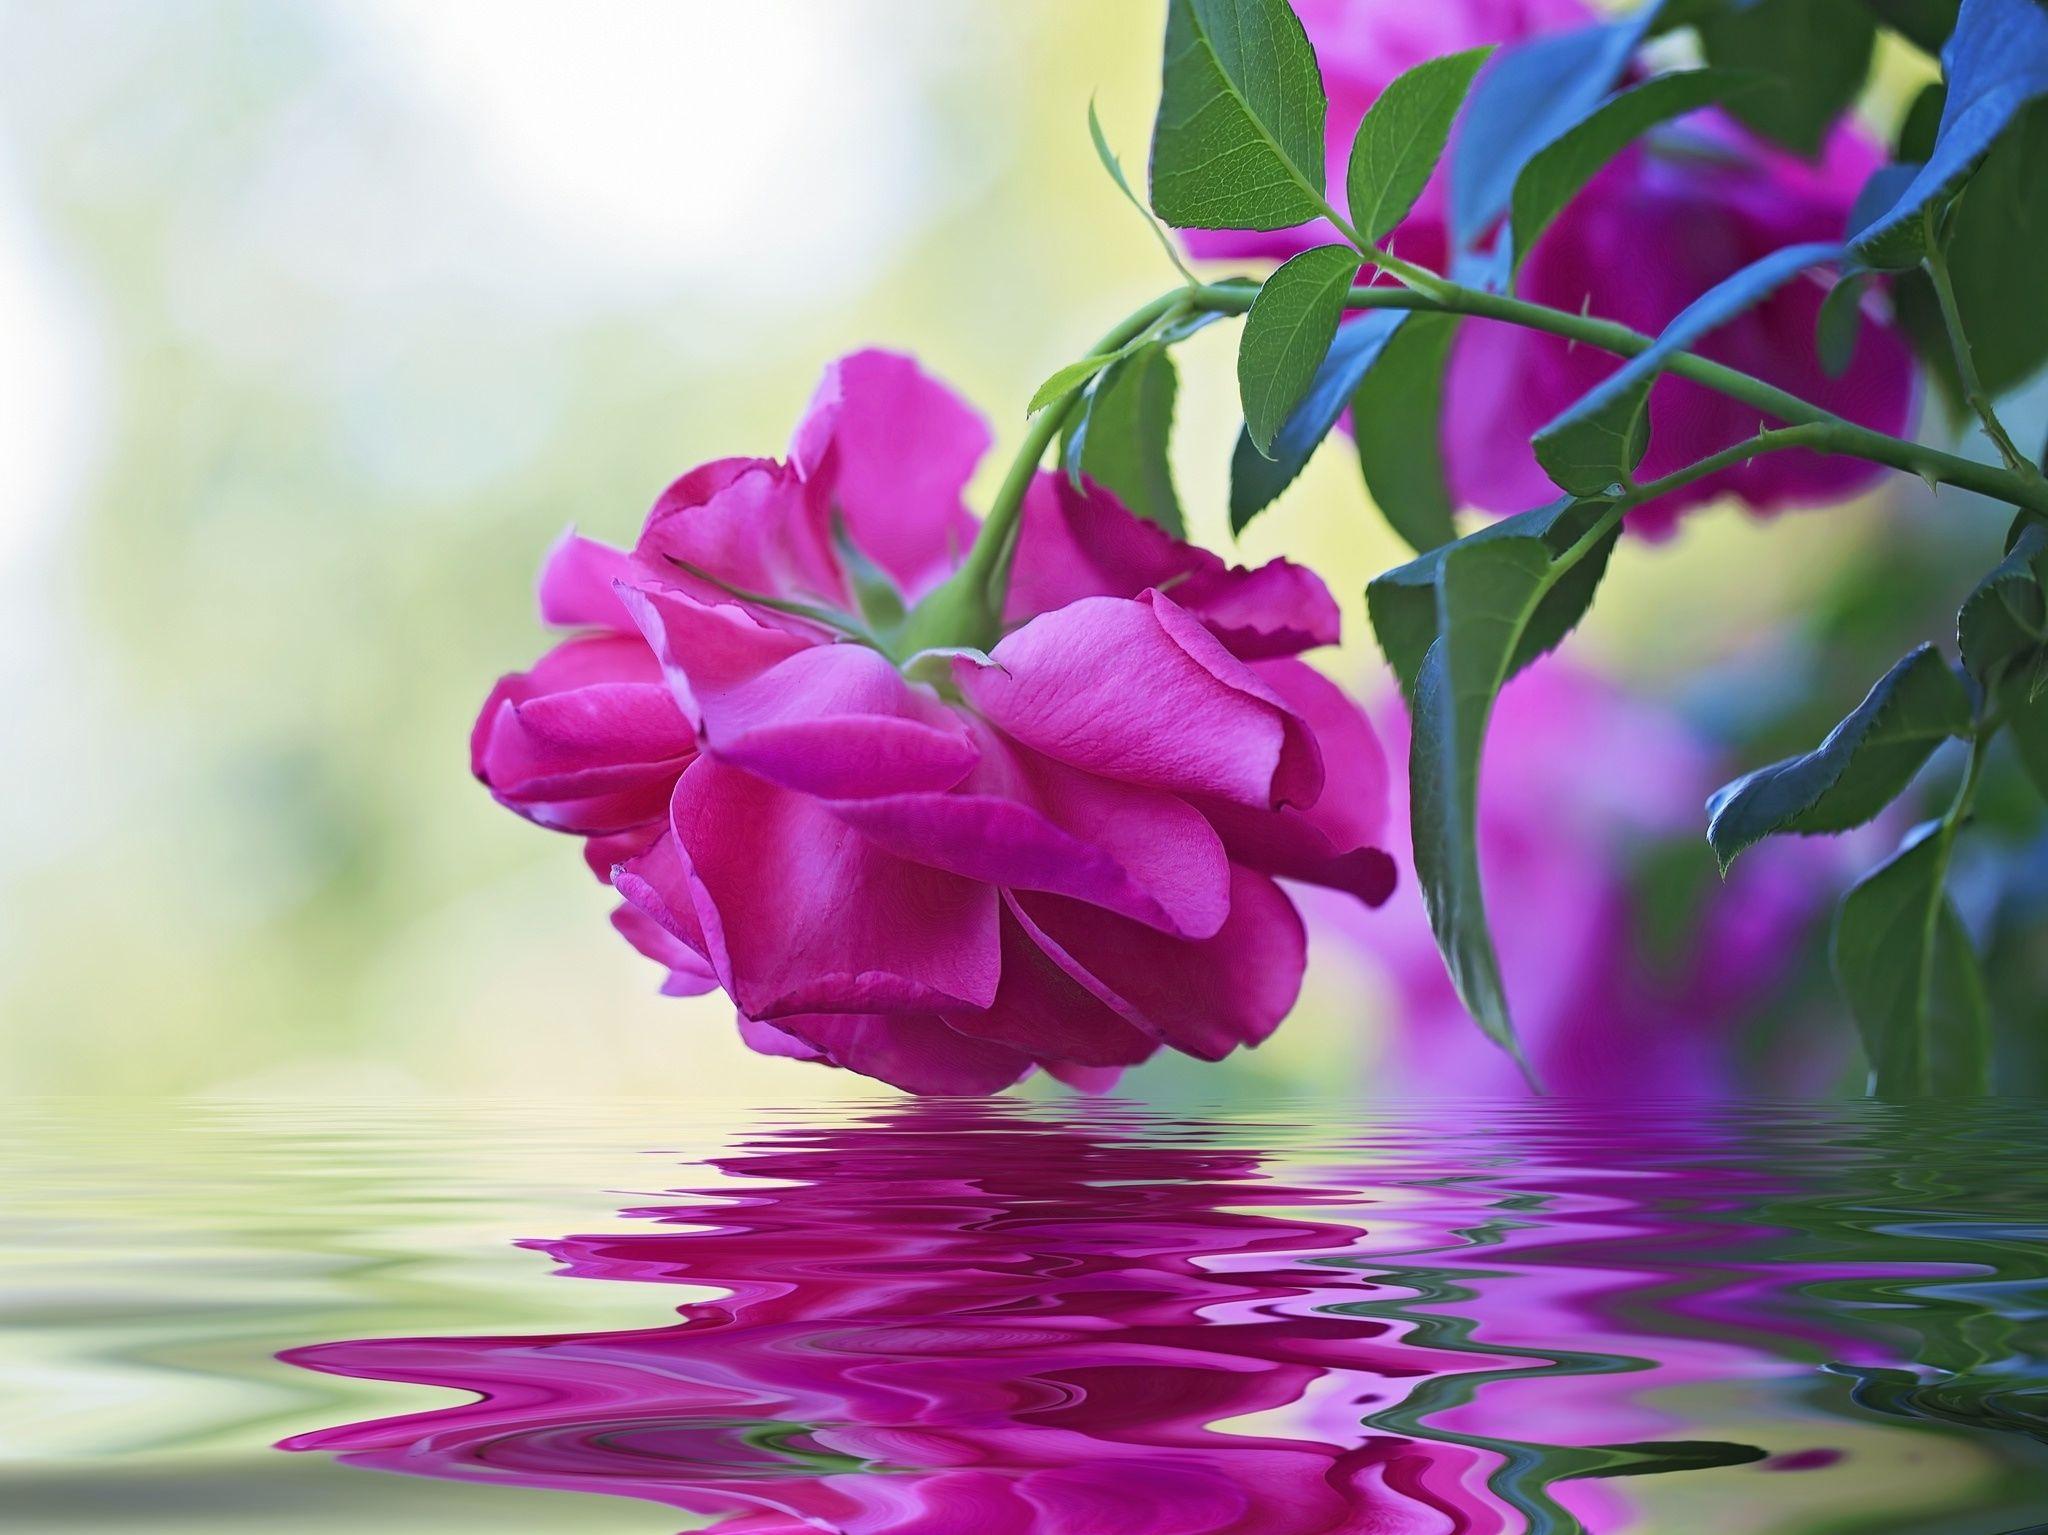 Rozowa Roza Beautiful Flowers Wallpapers Beautiful Flowers Photos Beautiful Flowers Images